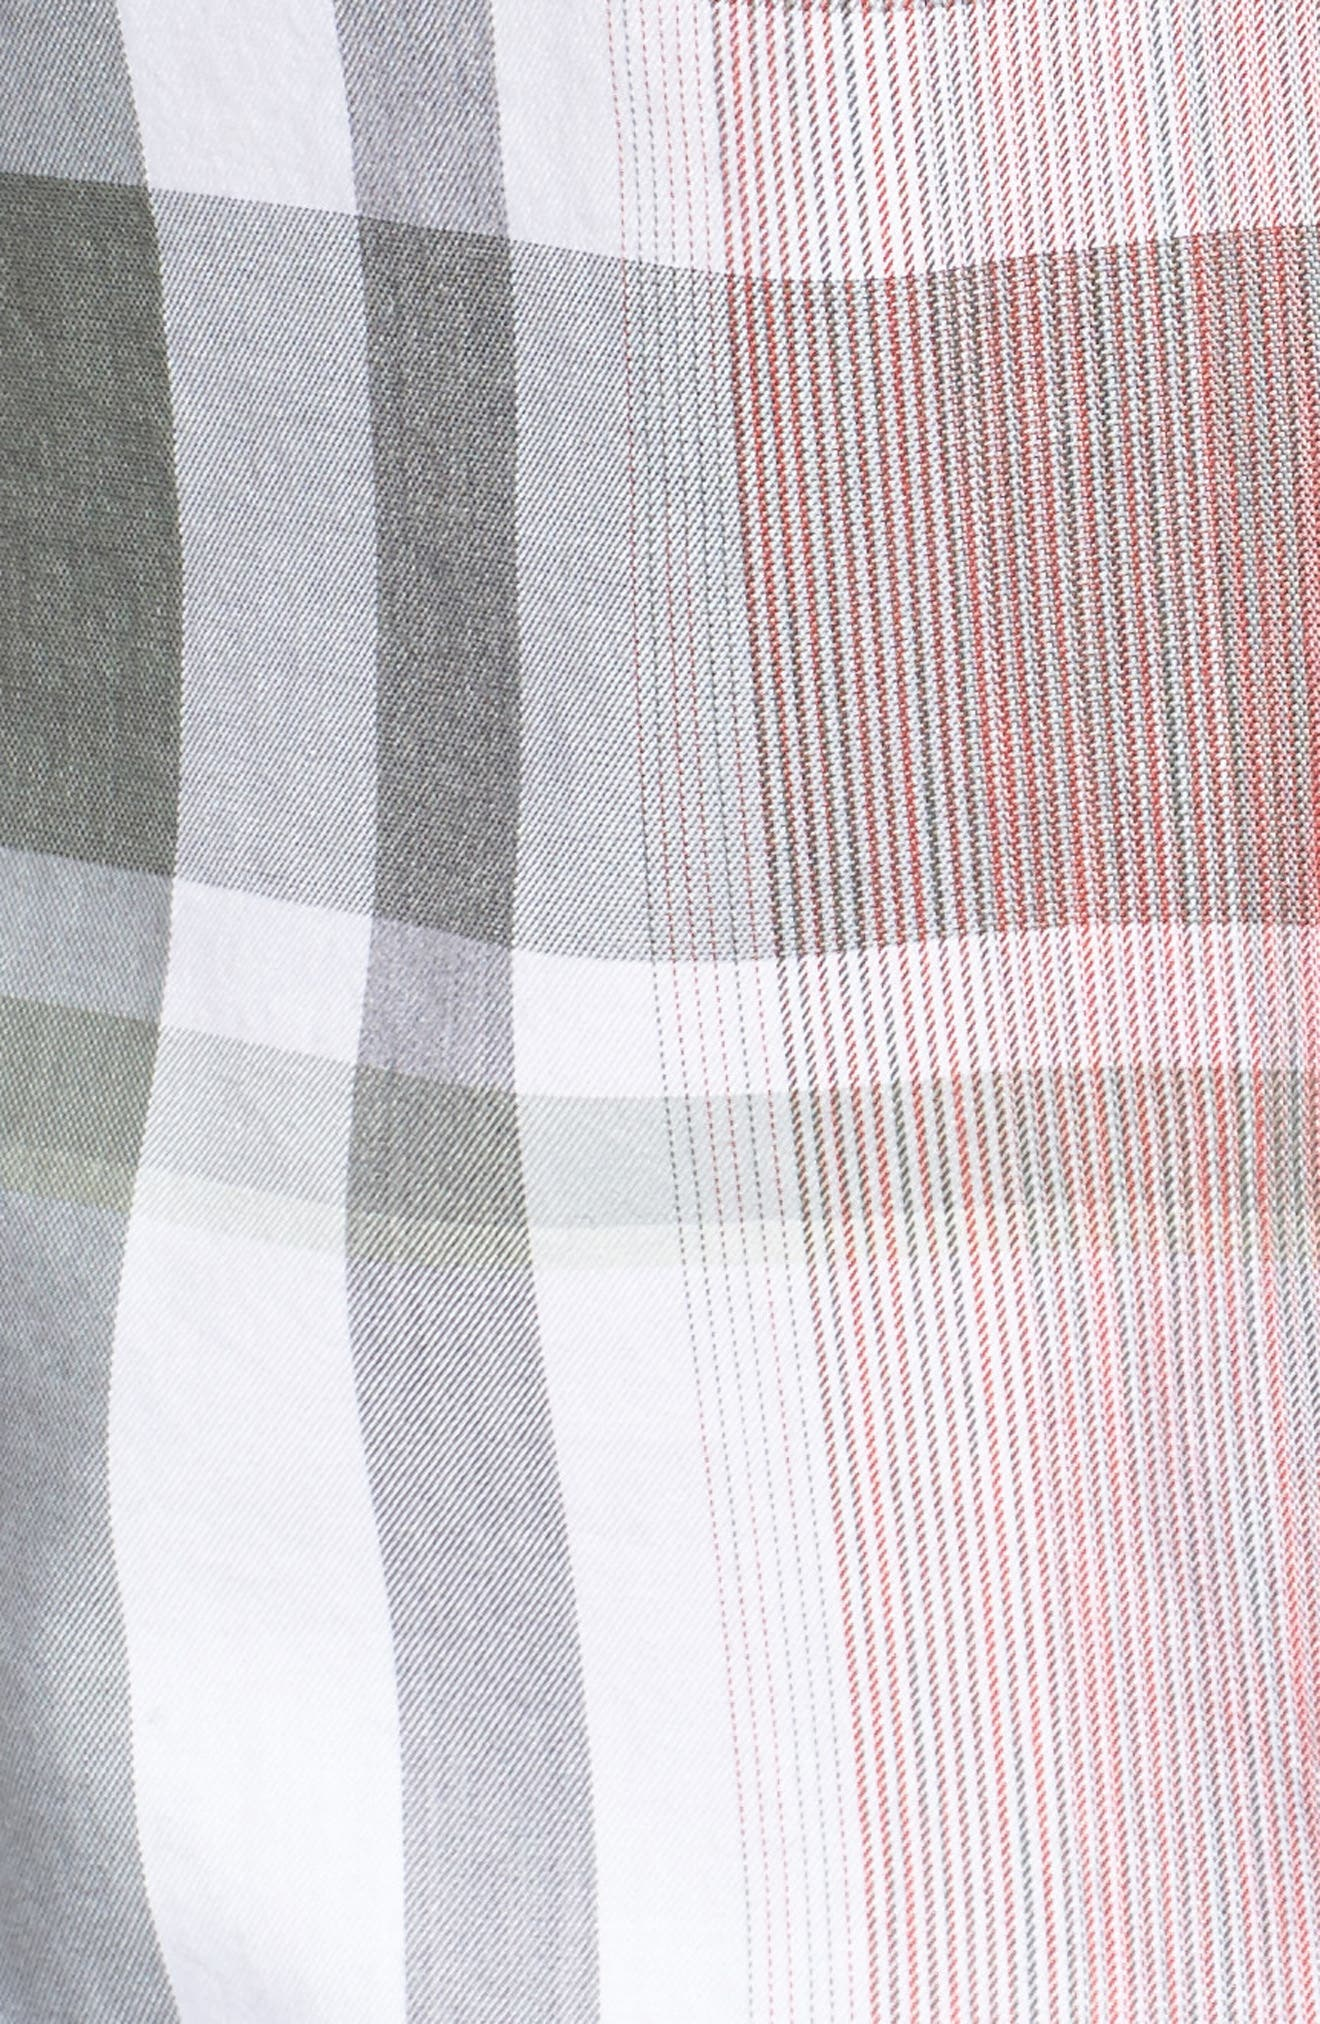 Robb Sharp Fit Plaid Sport Shirt,                             Alternate thumbnail 5, color,                             602